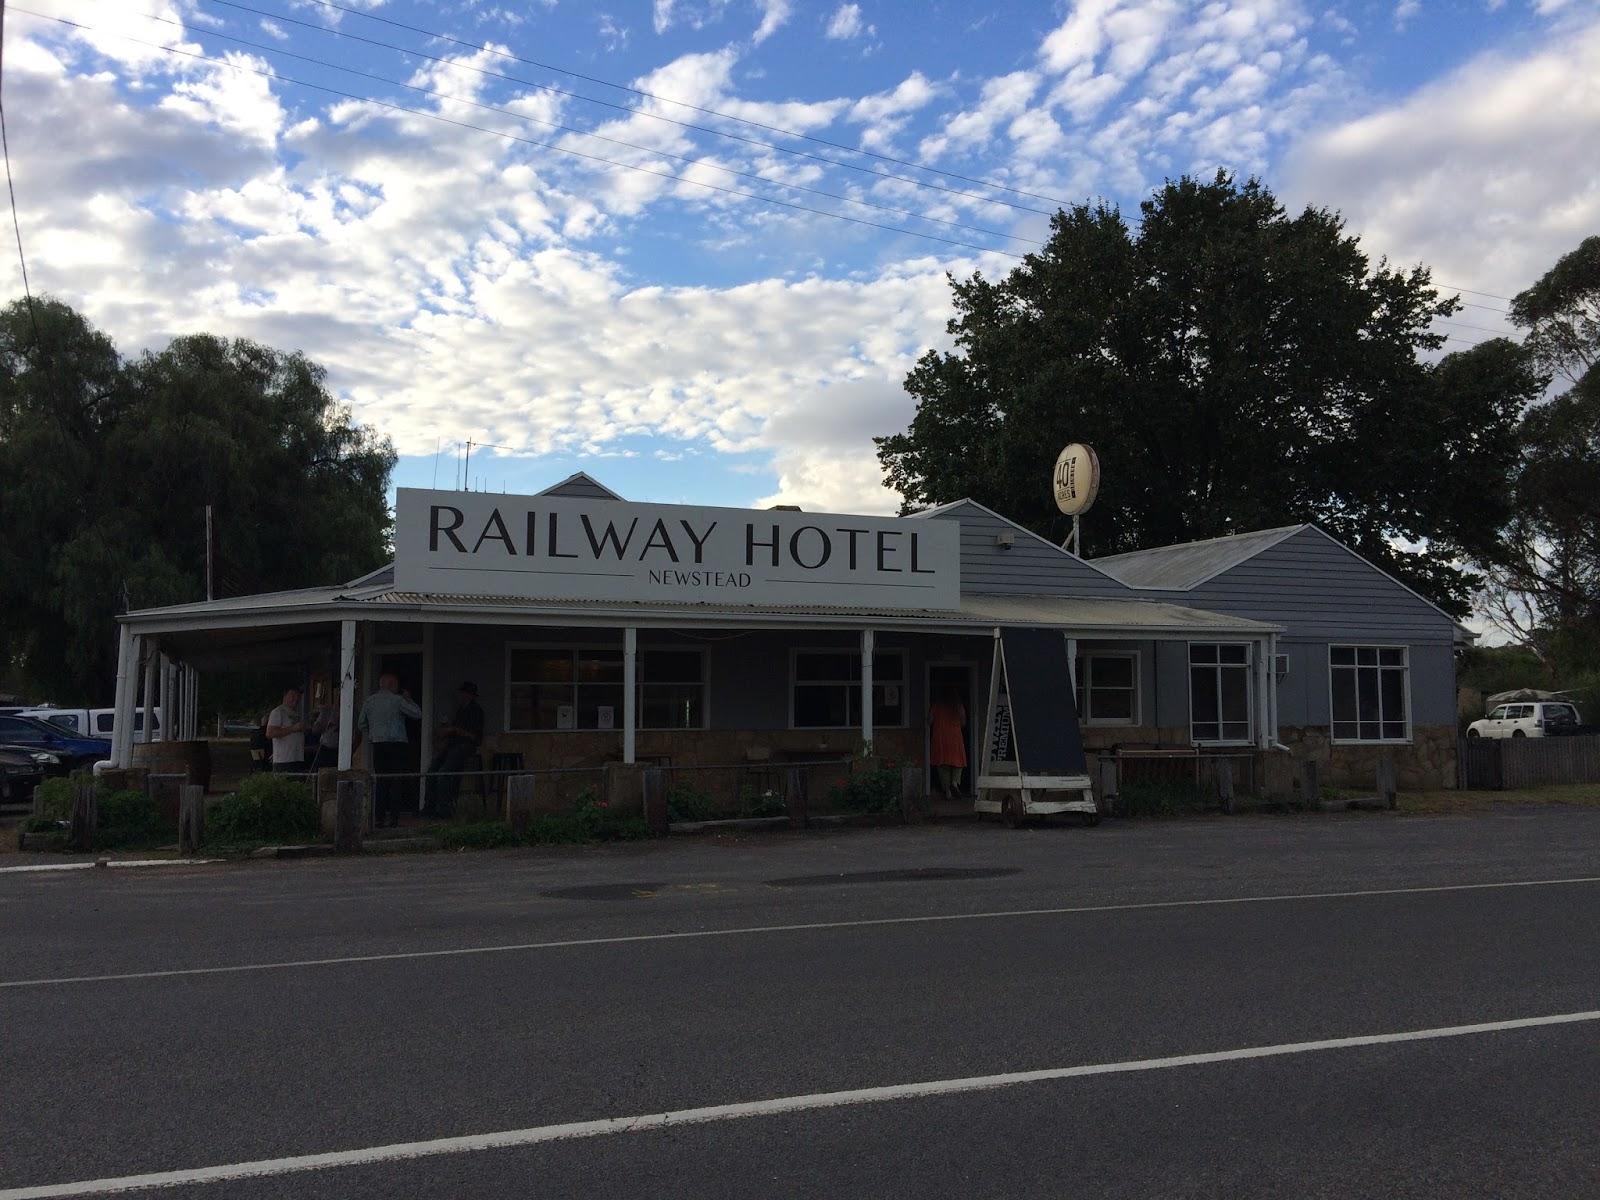 Best RV Resorts in Portarlington for 2020: Find Cheap $87 RV